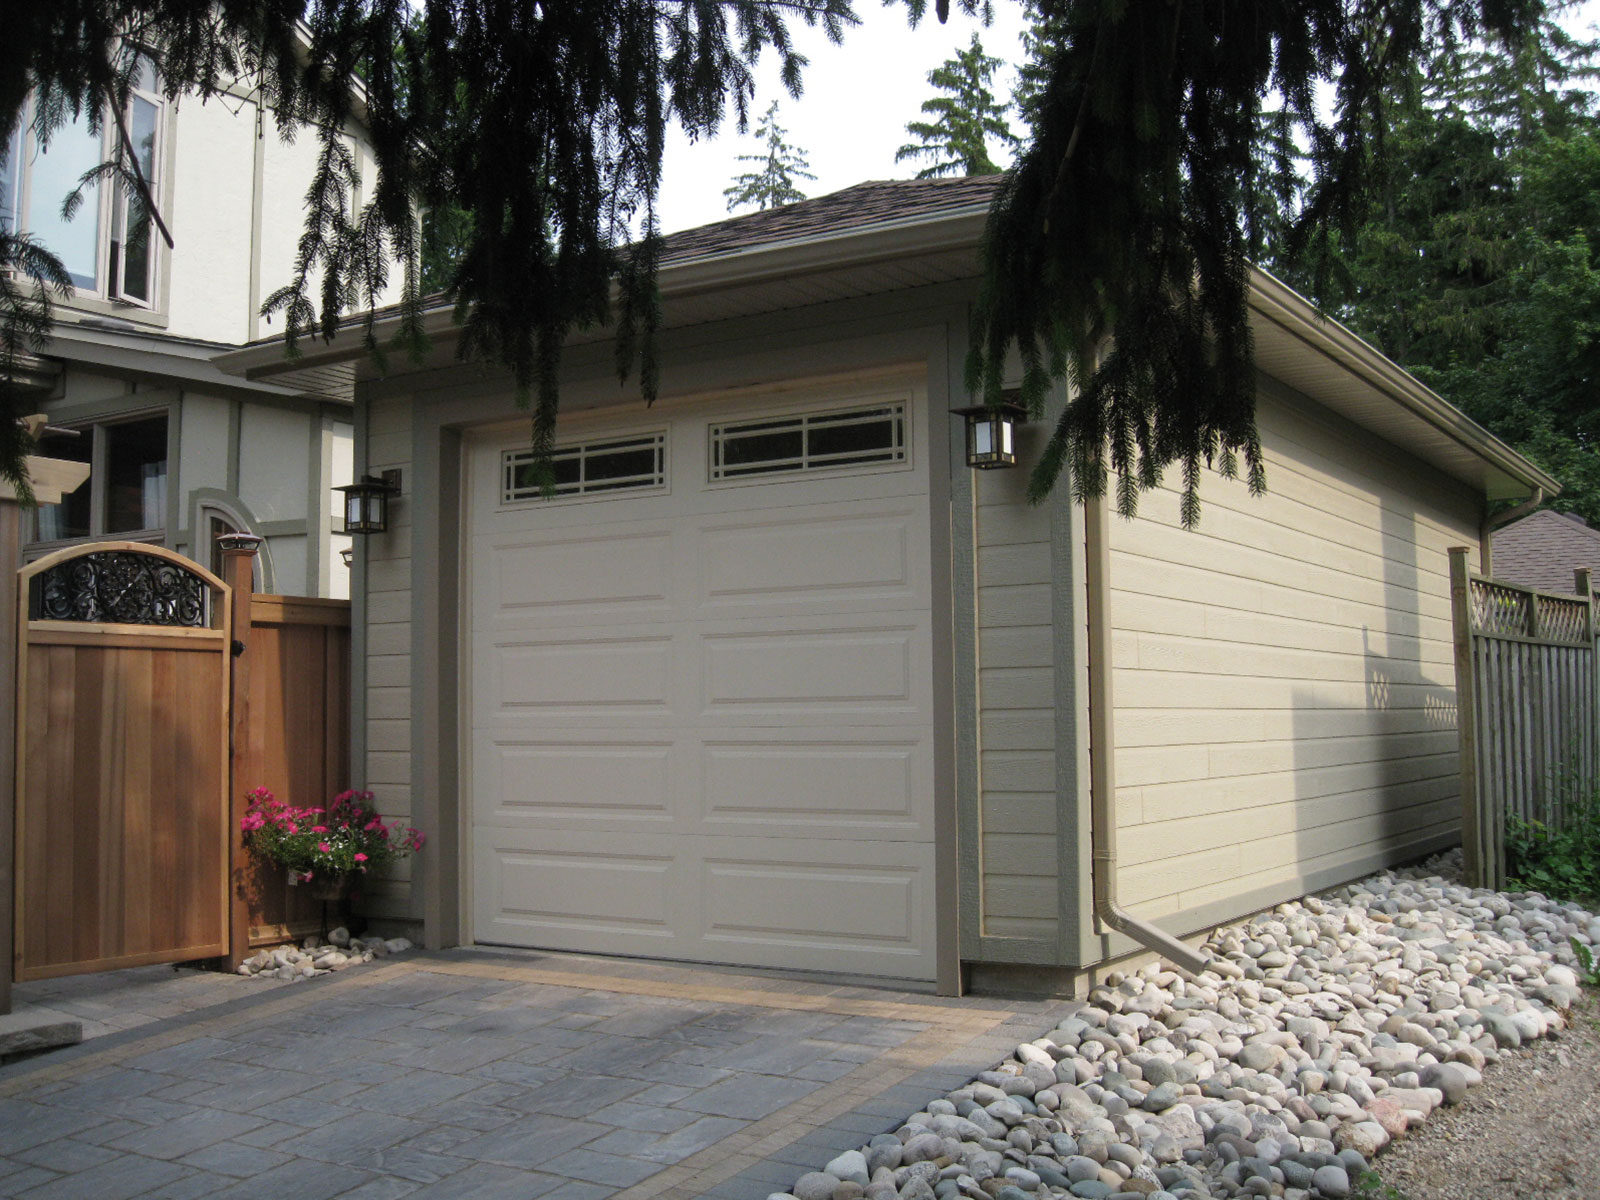 Maibec Sided Garage - New Build